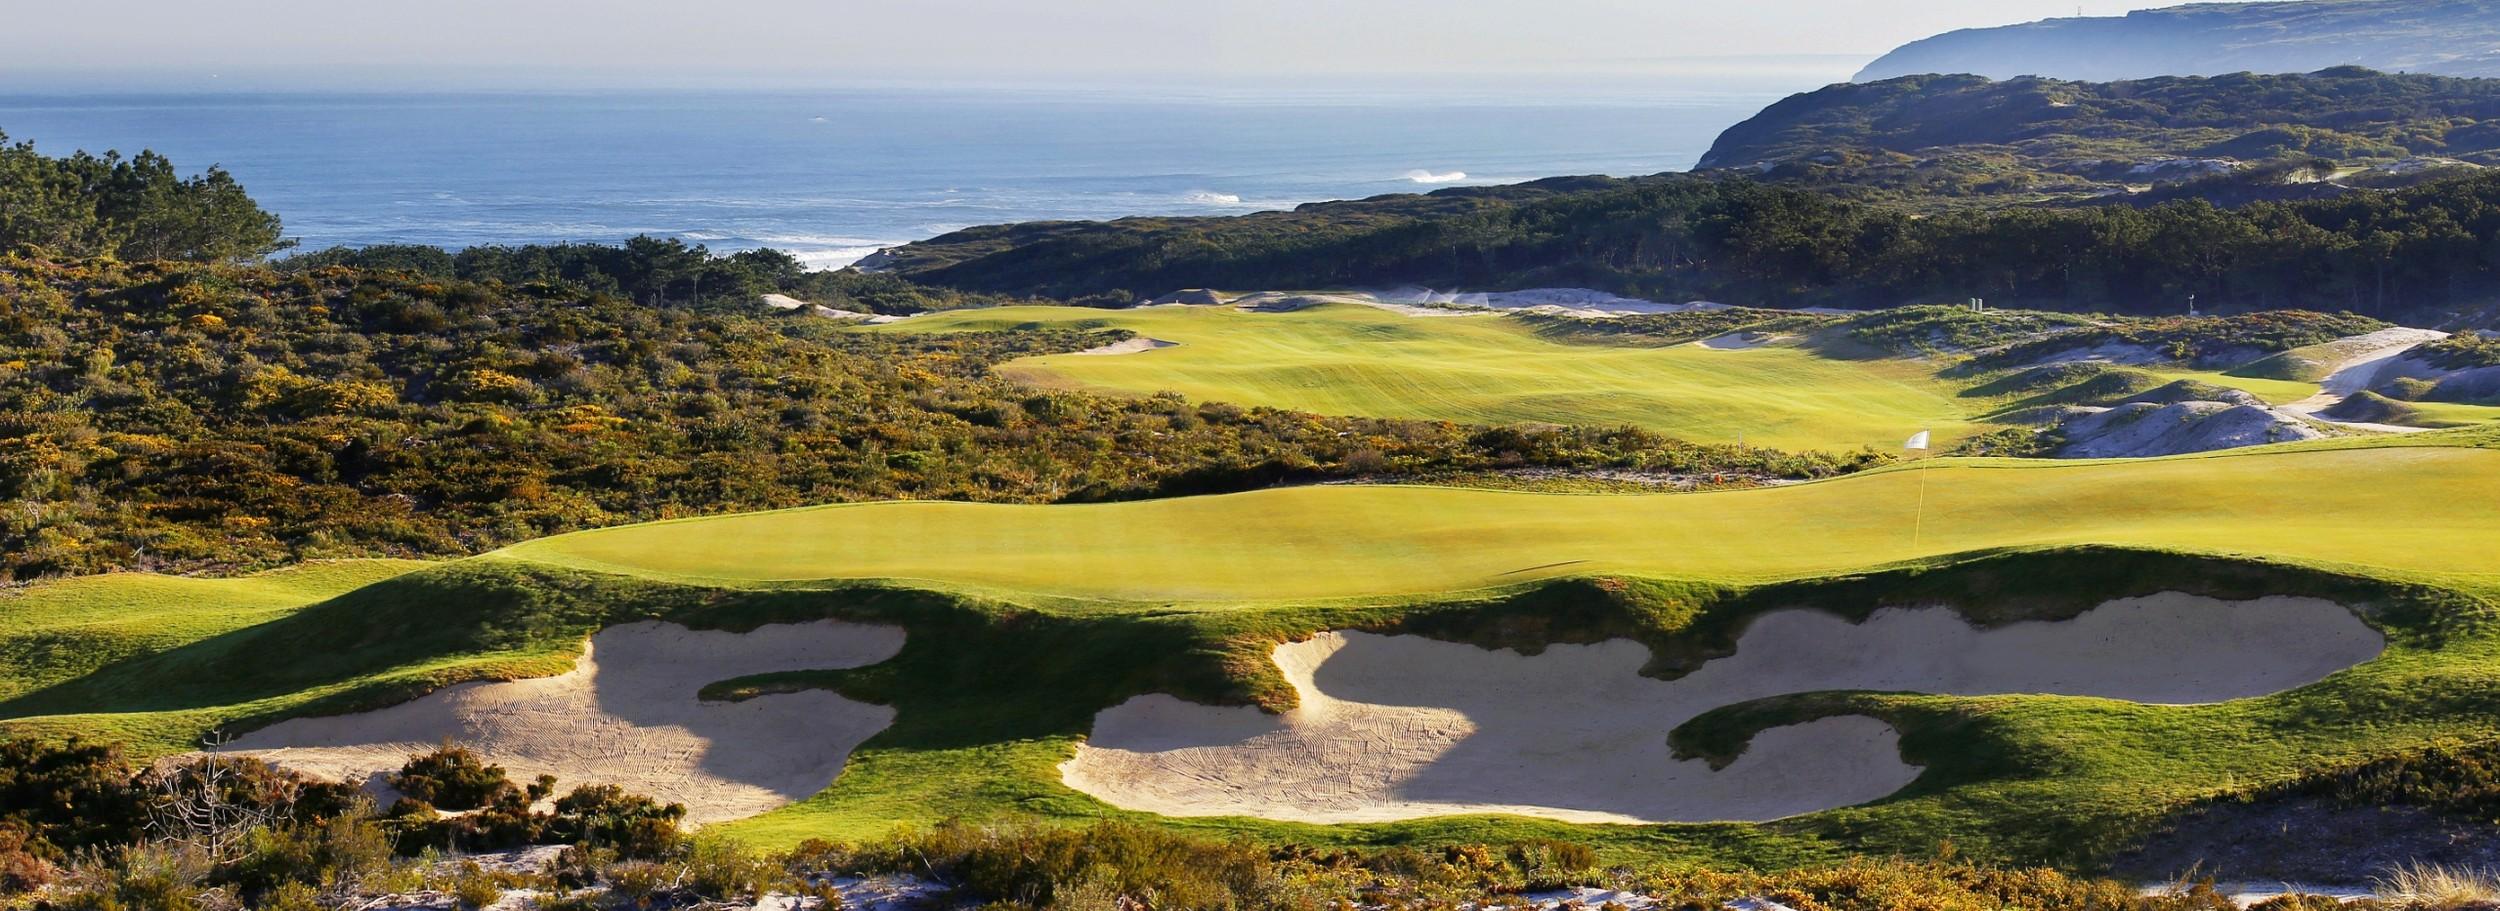 West Cliffs Golf Links, Portugal